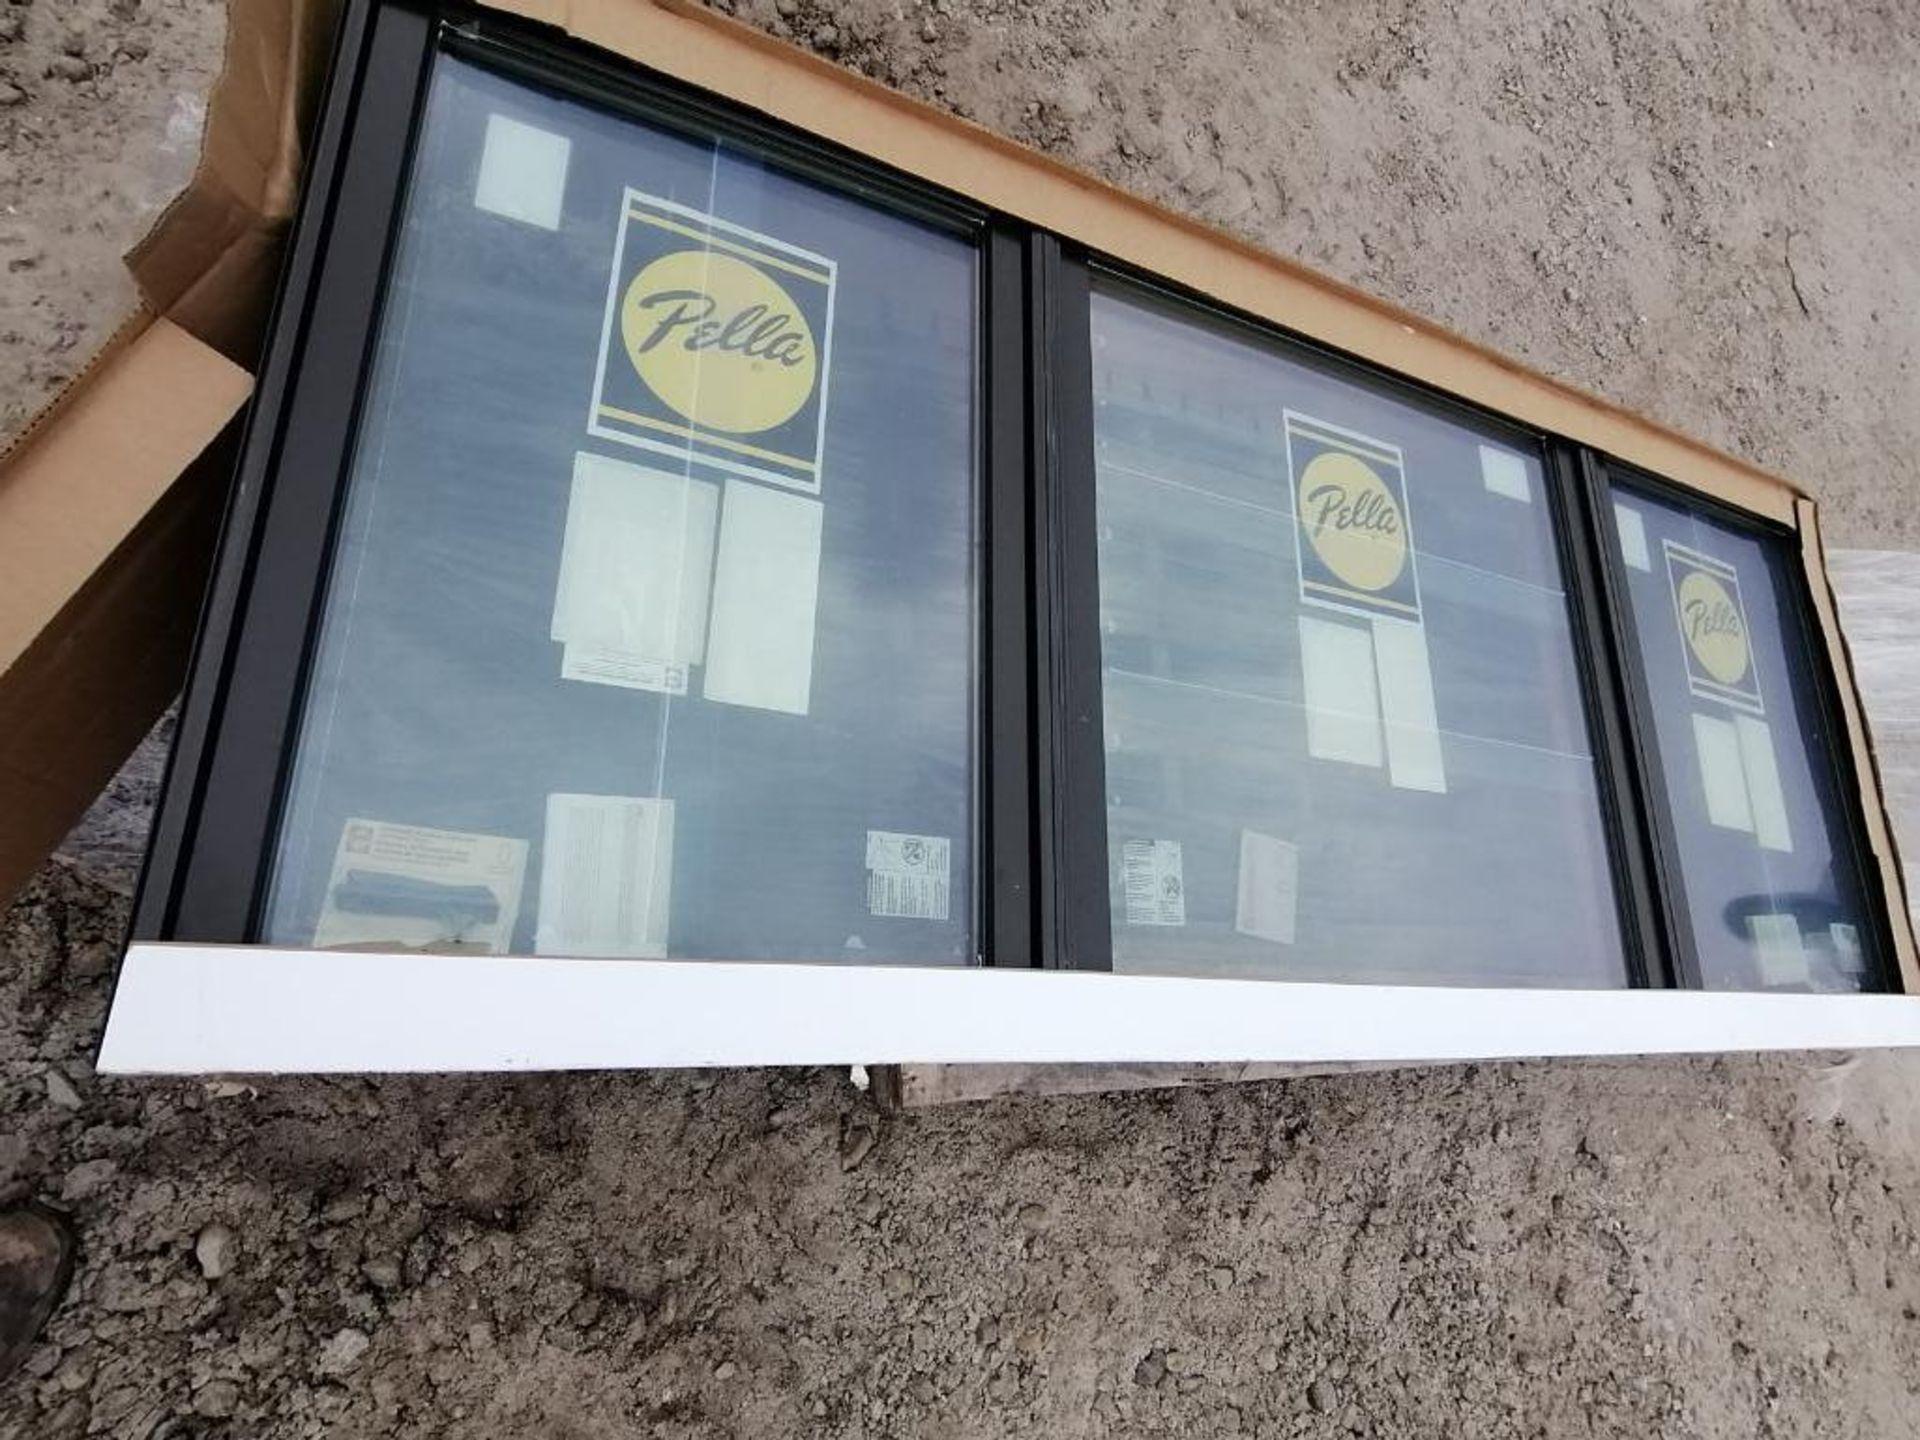 "(1) Pella 39"" x 99"" x 10"" Window with Frames. Located in Waukegan, IL."